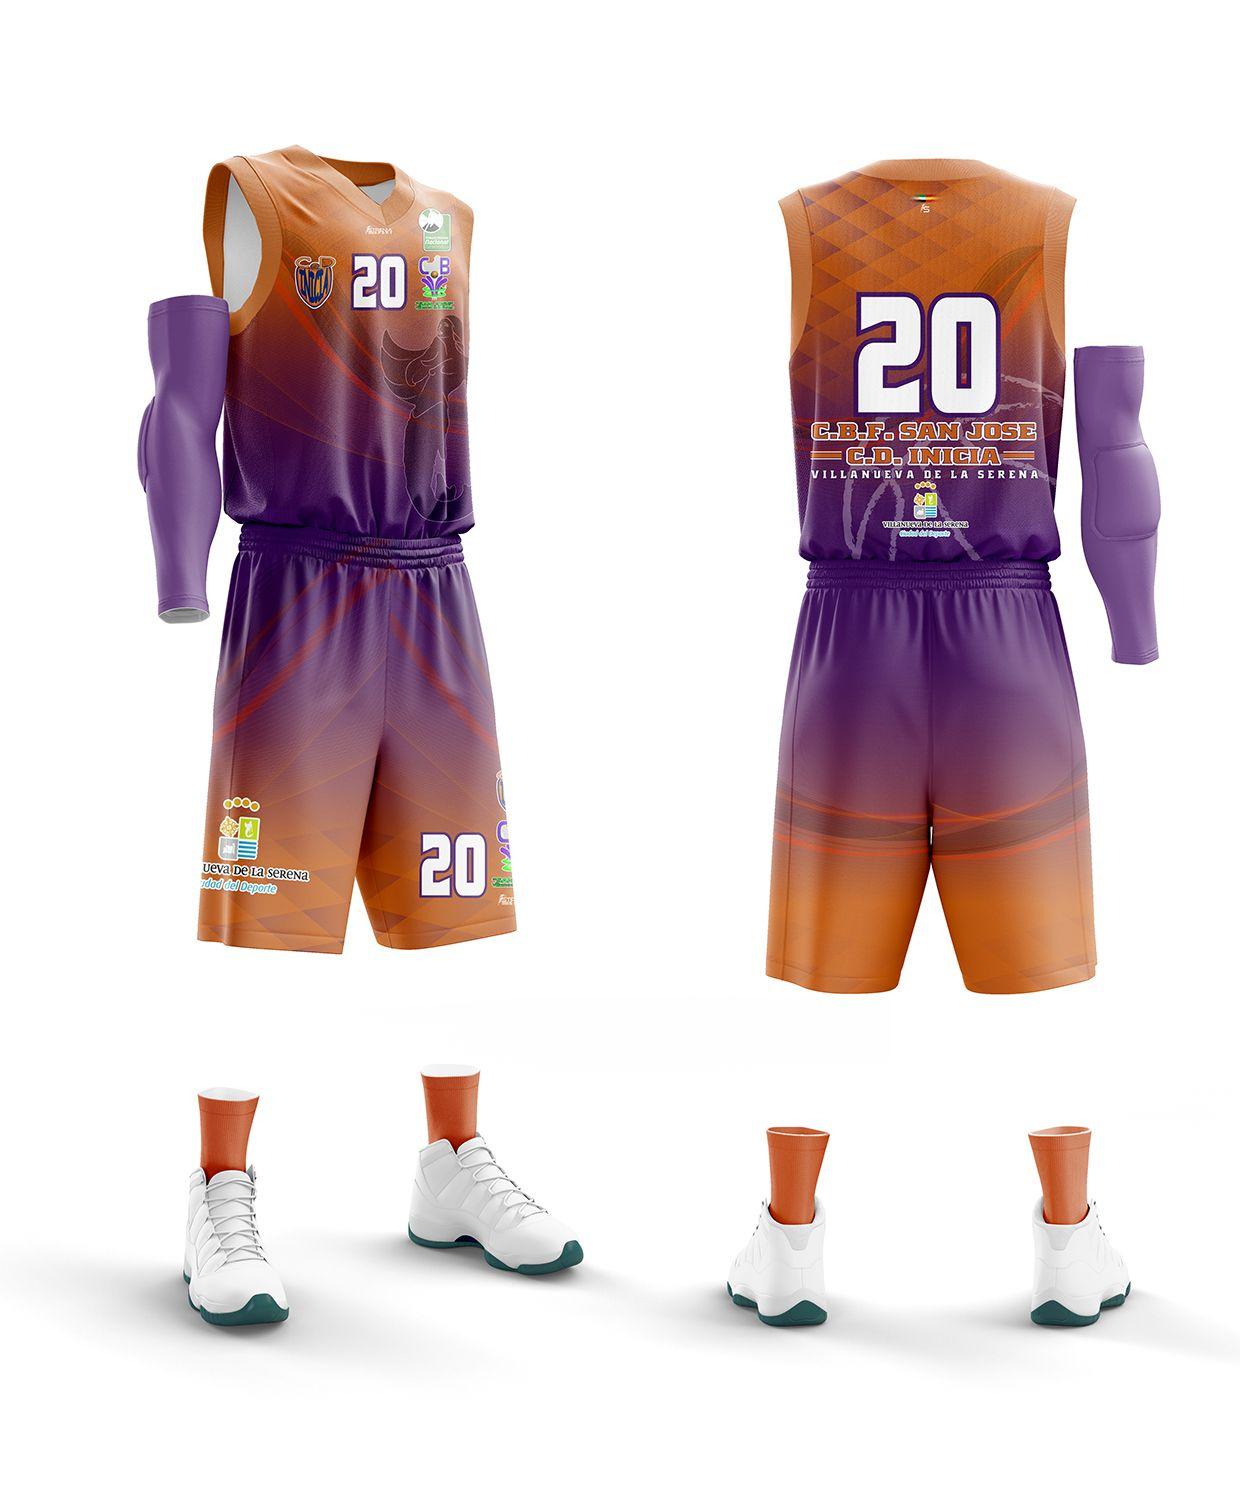 Basketball uniforms design image by STRENIA SPORT on